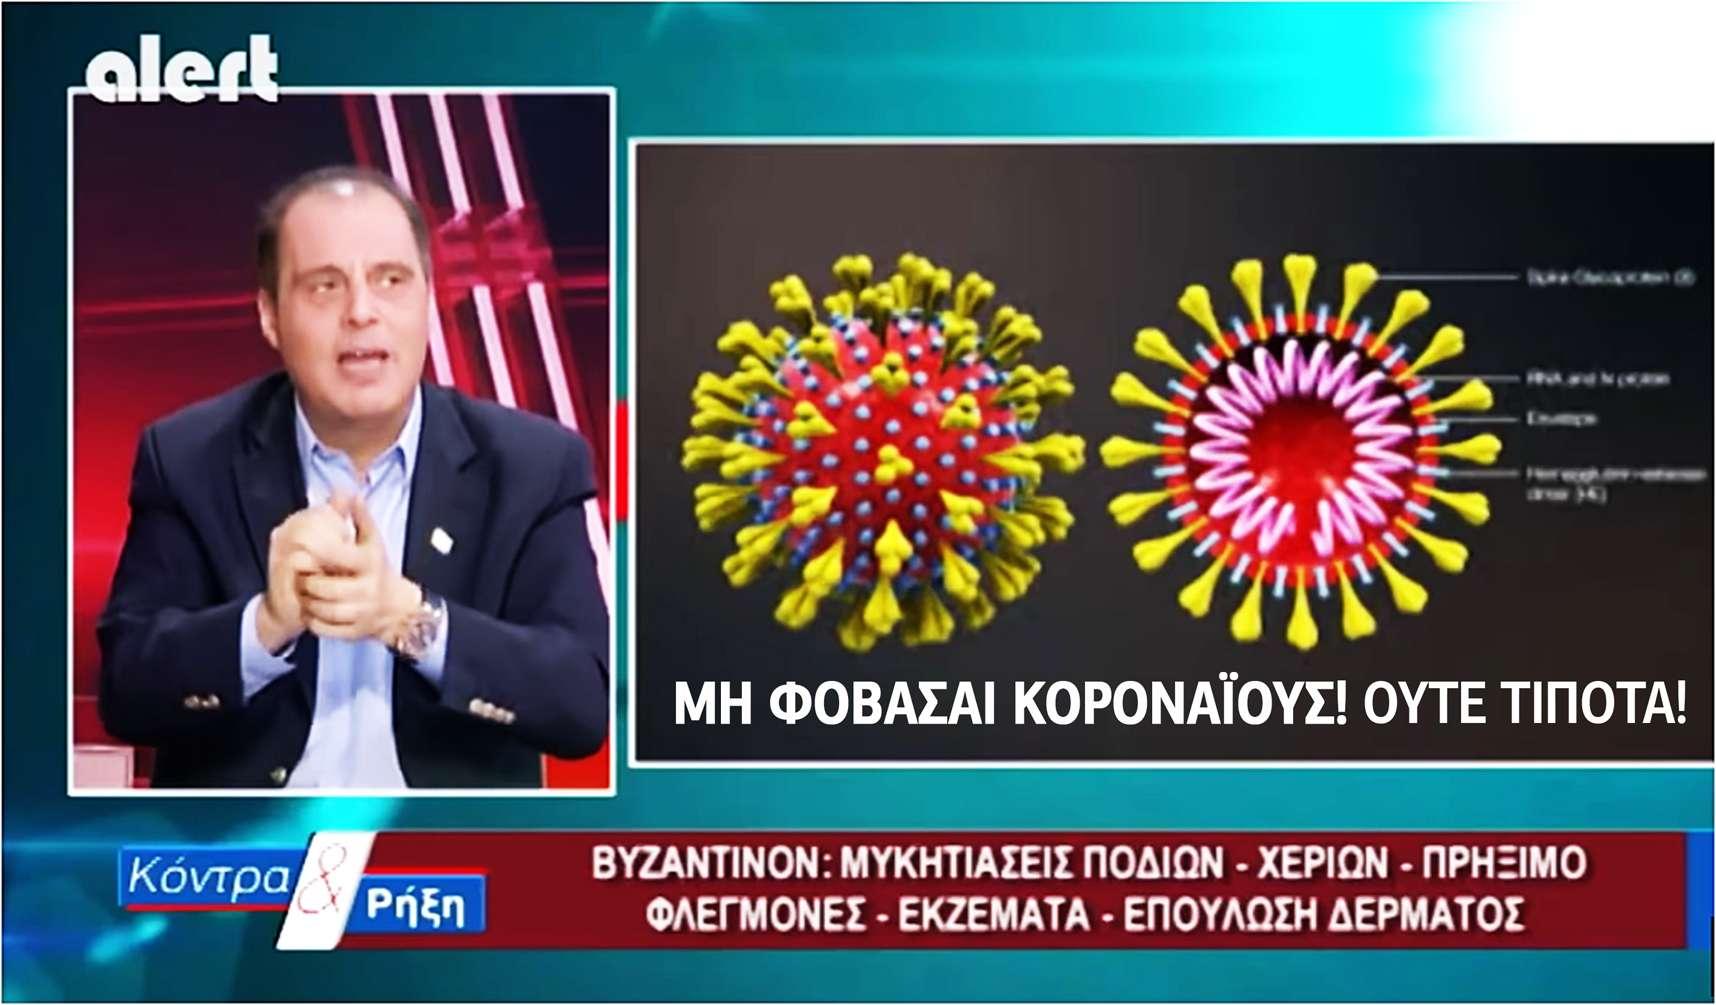 Coronavirus Ξεχάστε το εμβόλιο ο Βελόπουλος λανσάρει ήδη κηραλοιφή